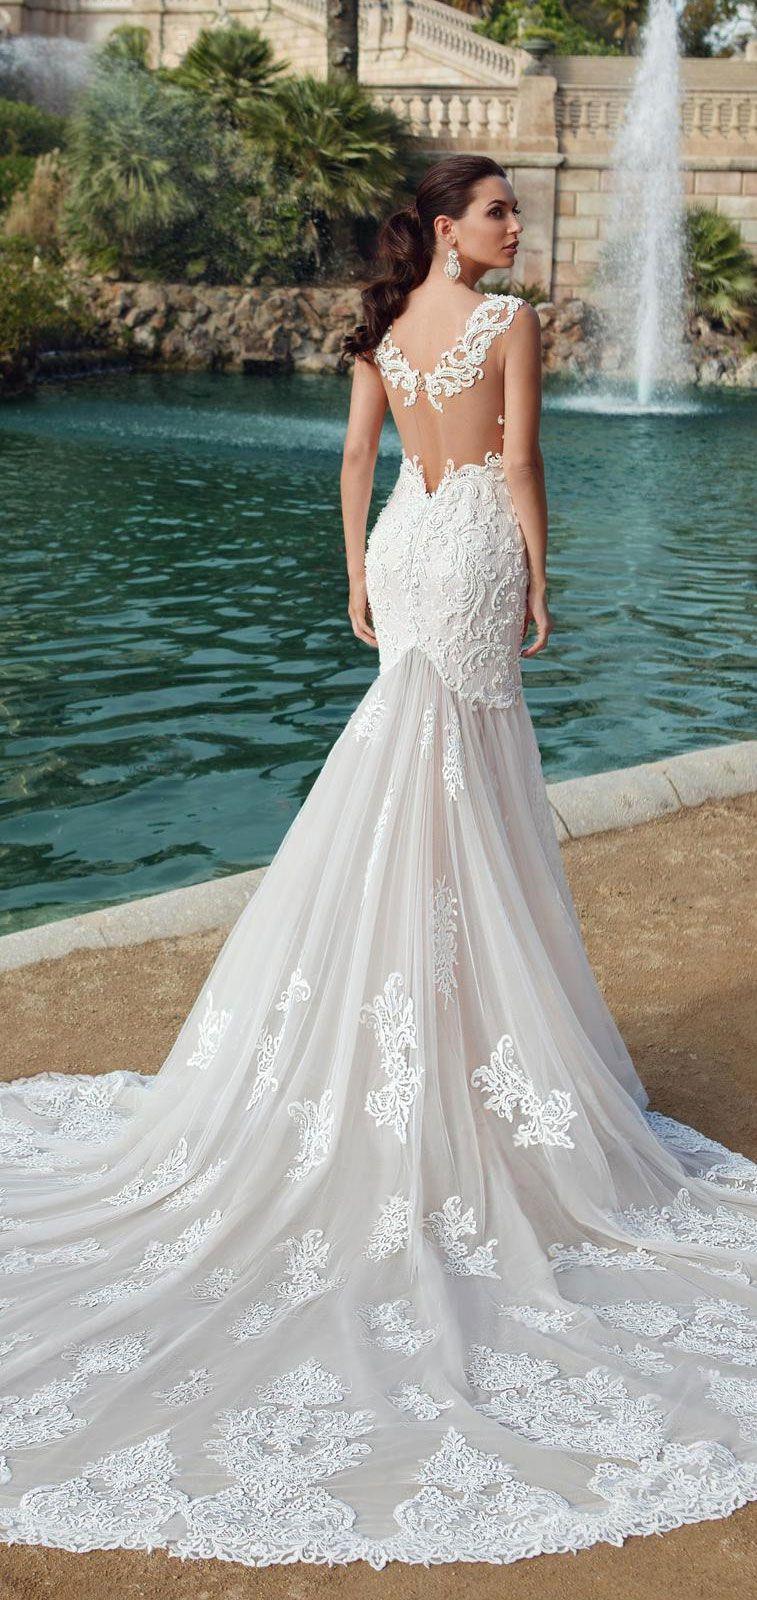 The Best Mermaid Wedding Dress